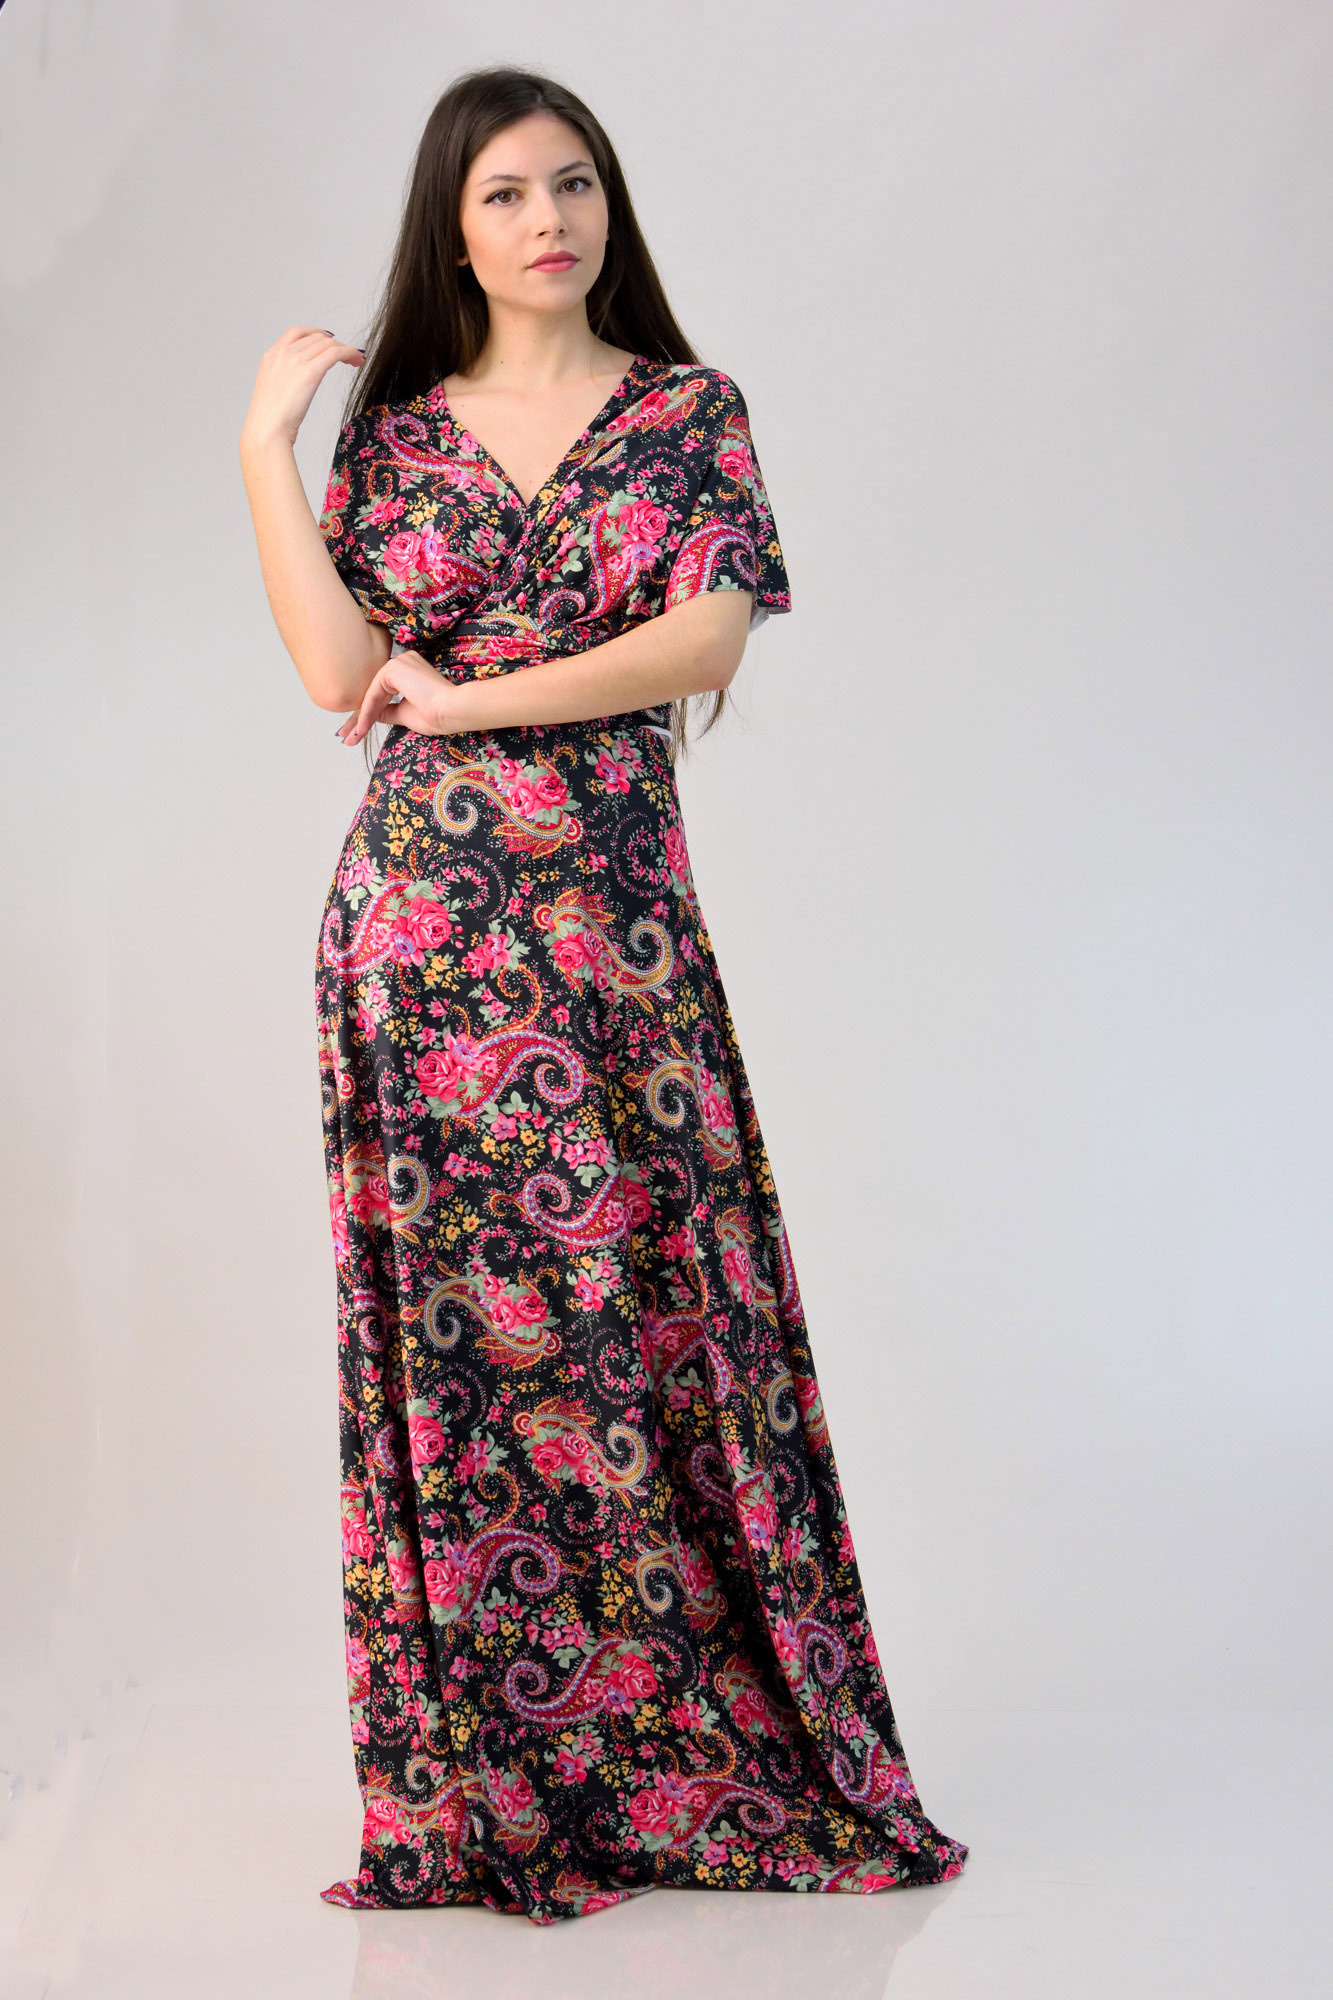 f46ff484078 Πολυμορφικό φόρεμα. Tap to expand